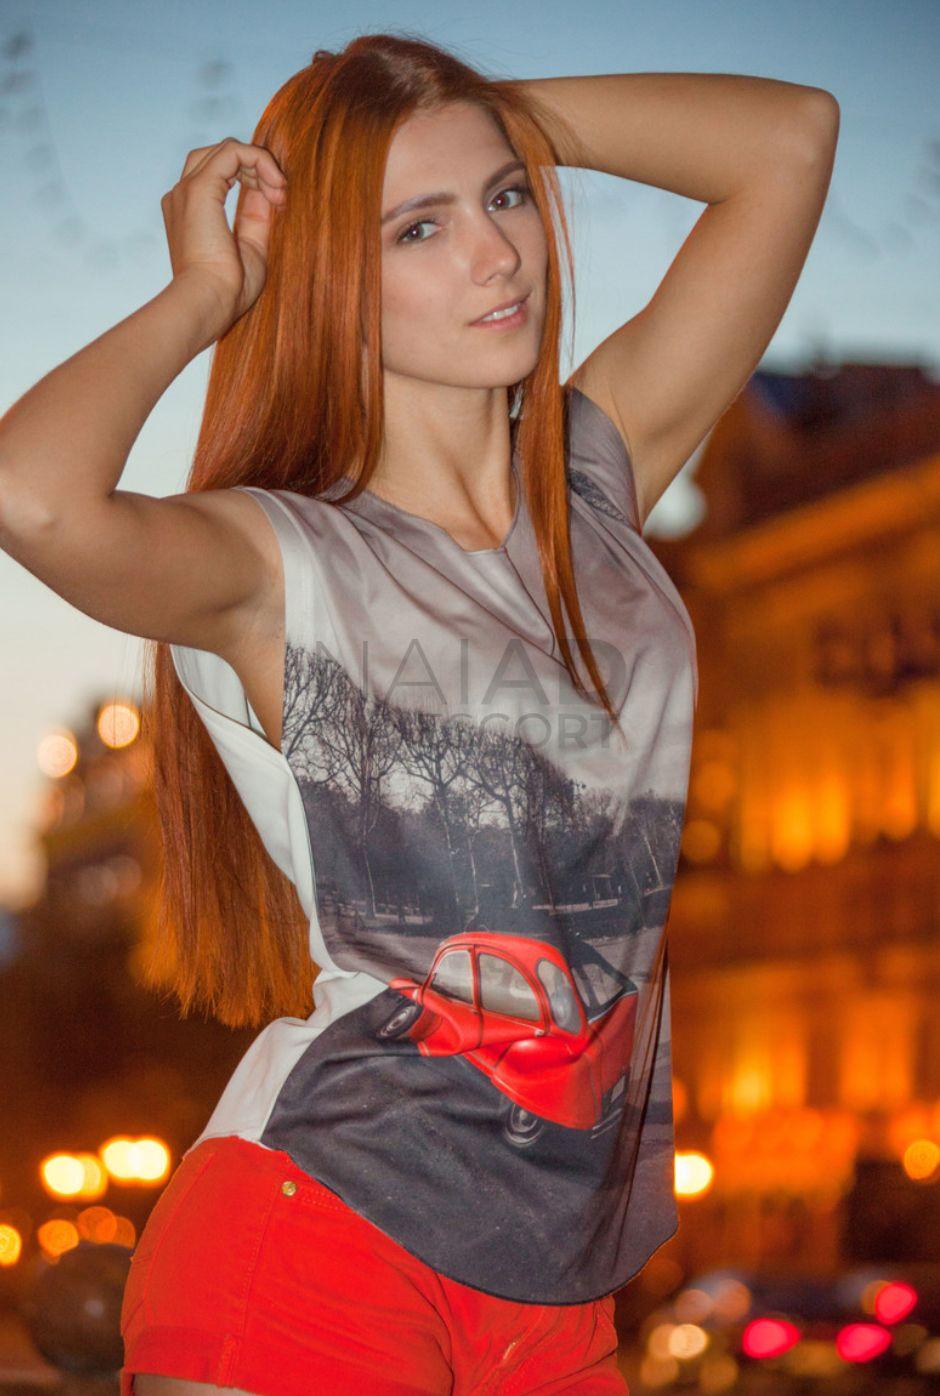 Photo of Vanya on Naiad vip escort service in Paris